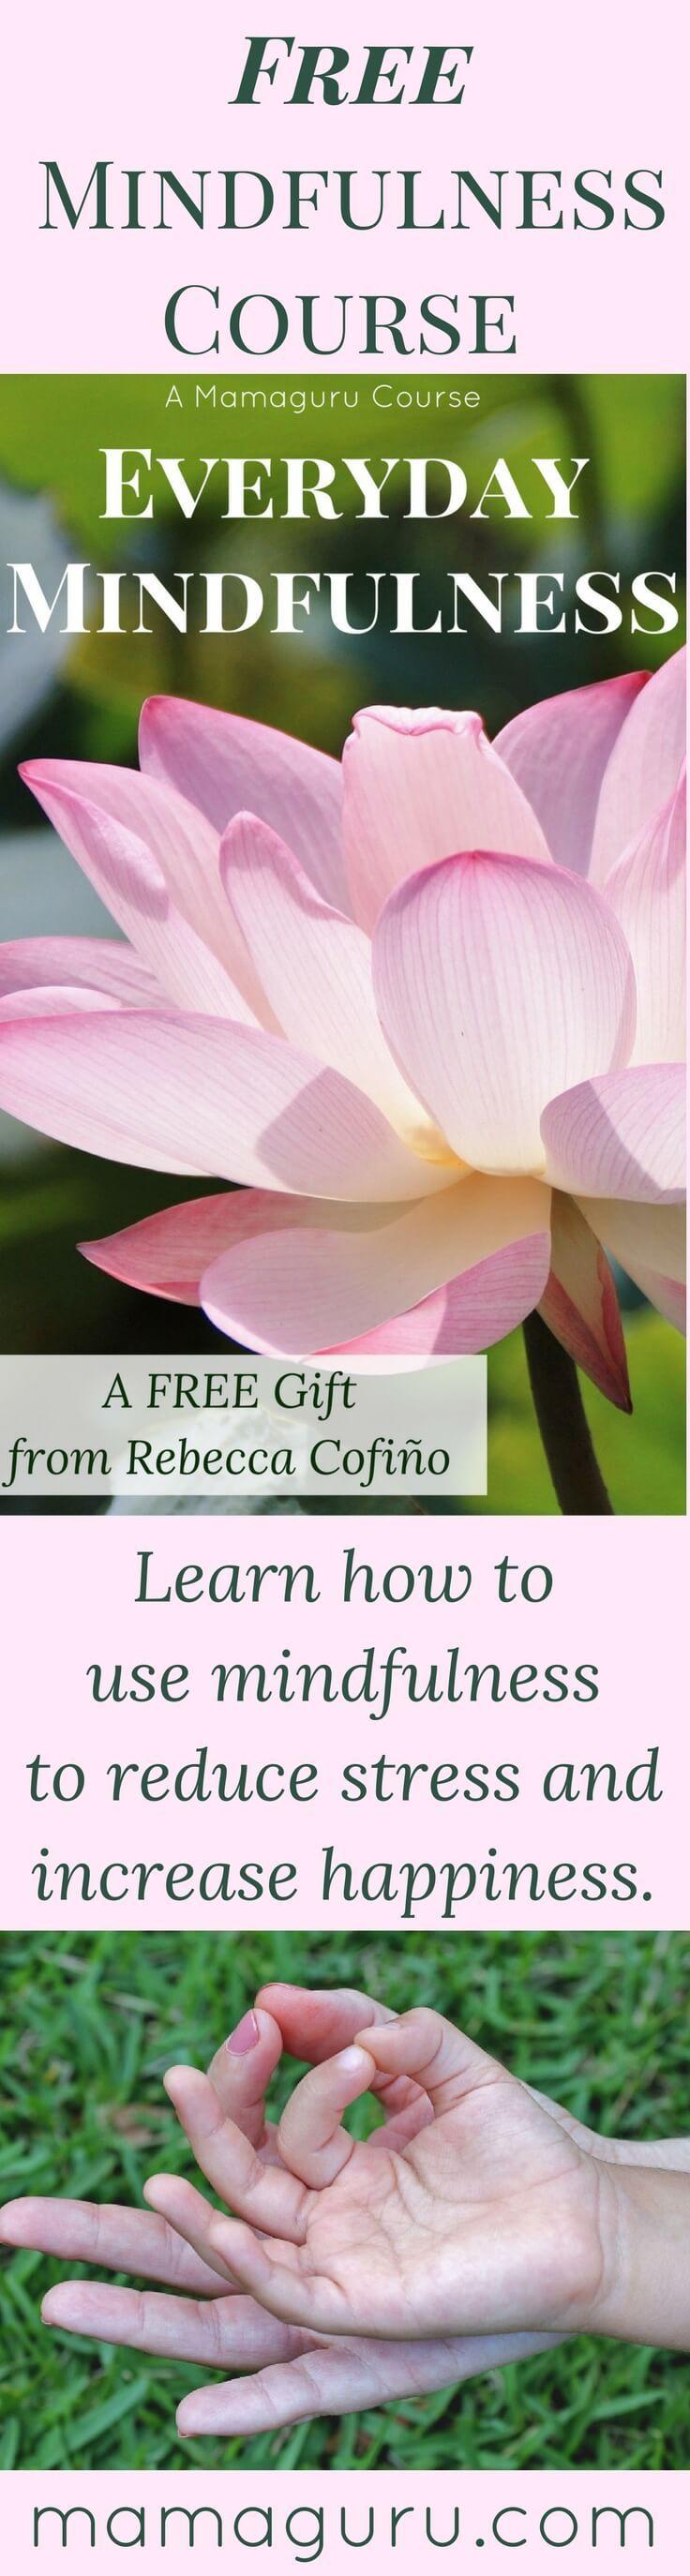 Mindfulness • Free Mindfulness Course • Happiness • Inner Peace • Meditation • Yoga